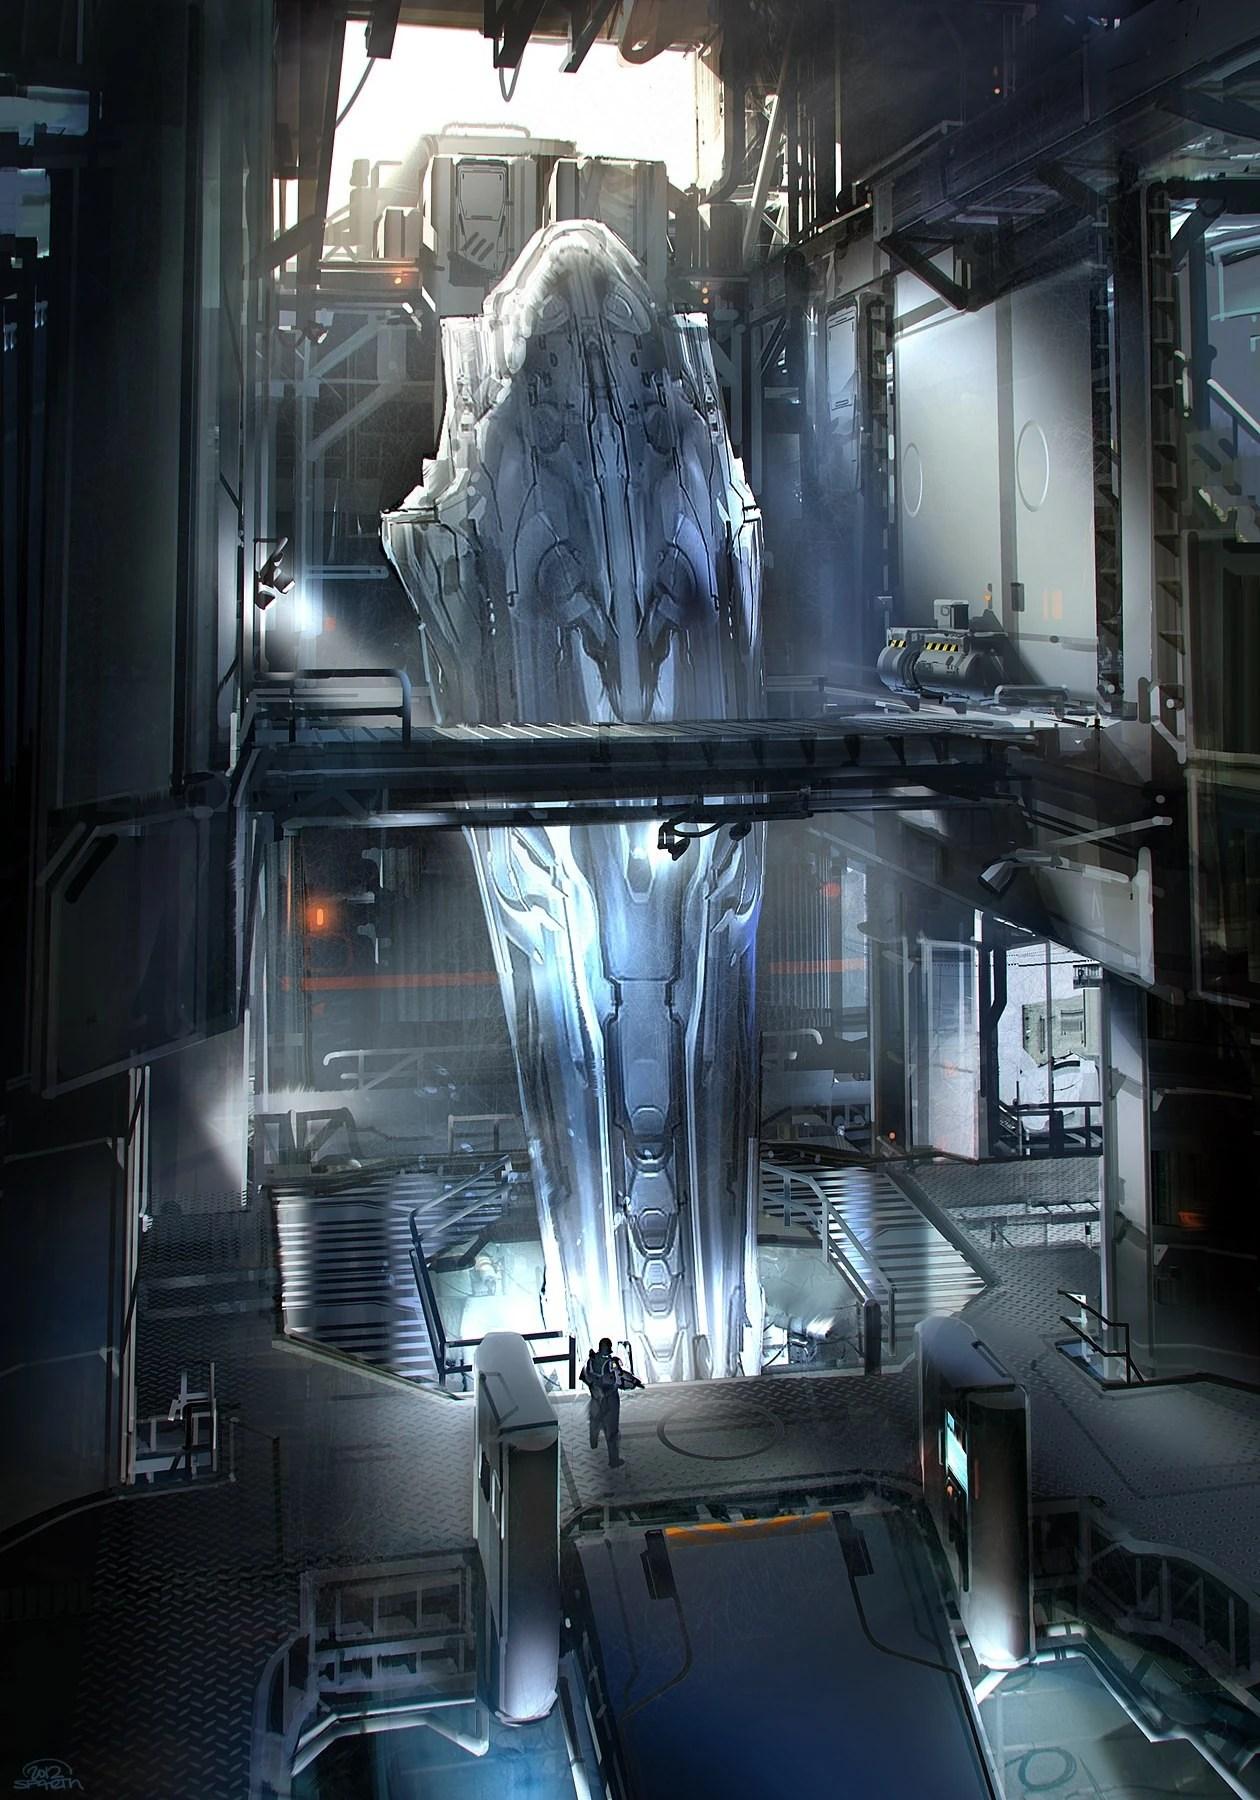 https://i1.wp.com/images.wikia.com/halo/images/4/49/Halo4concept08.jpg